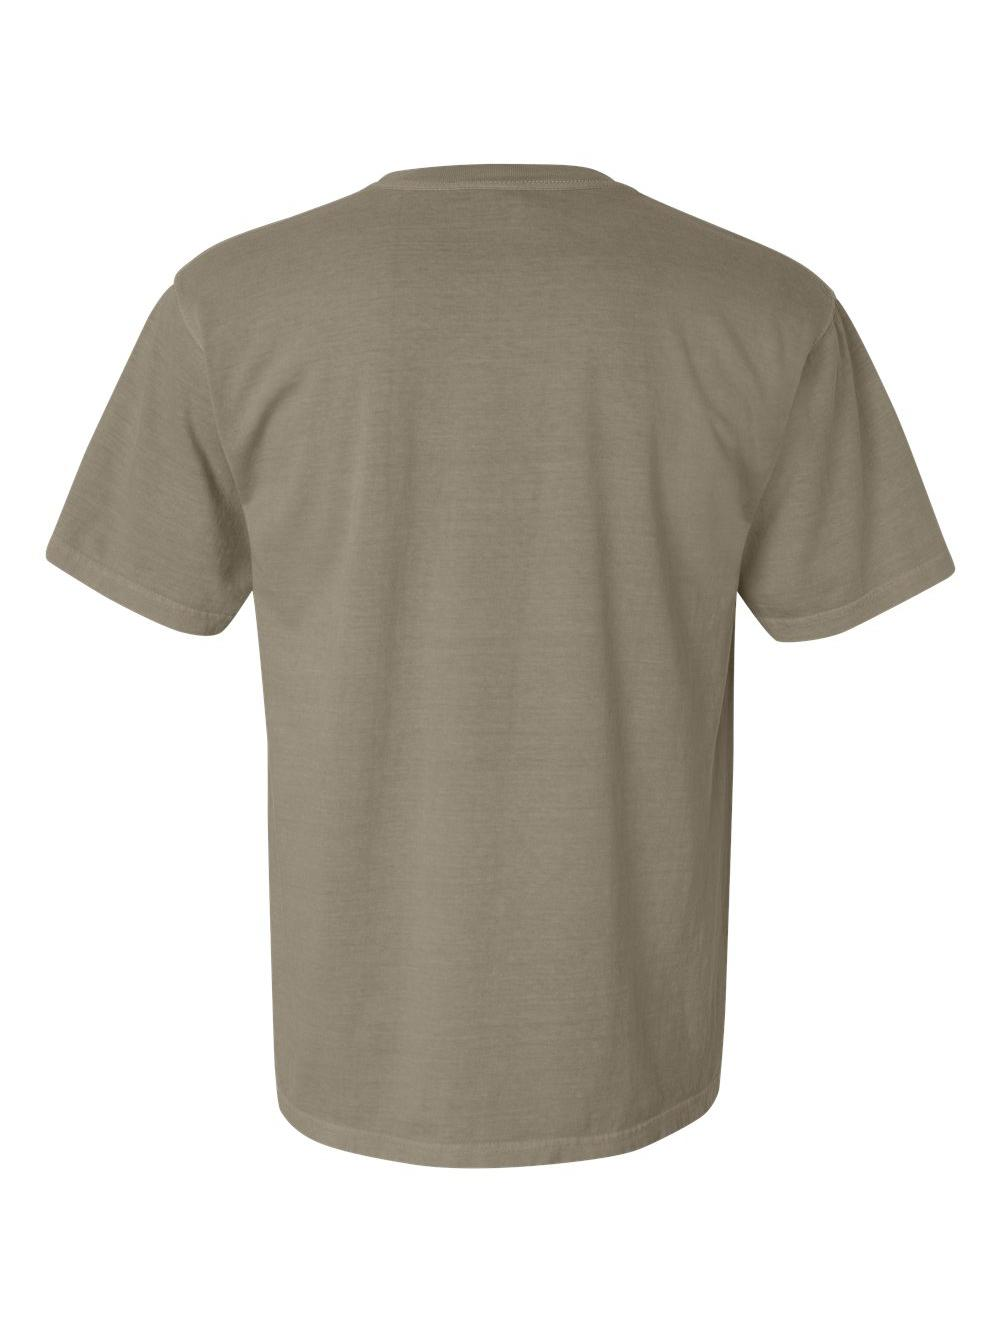 Comfort-Colors-Garment-Dyed-Heavyweight-Ringspun-Short-Sleeve-Shirt-1717 thumbnail 73